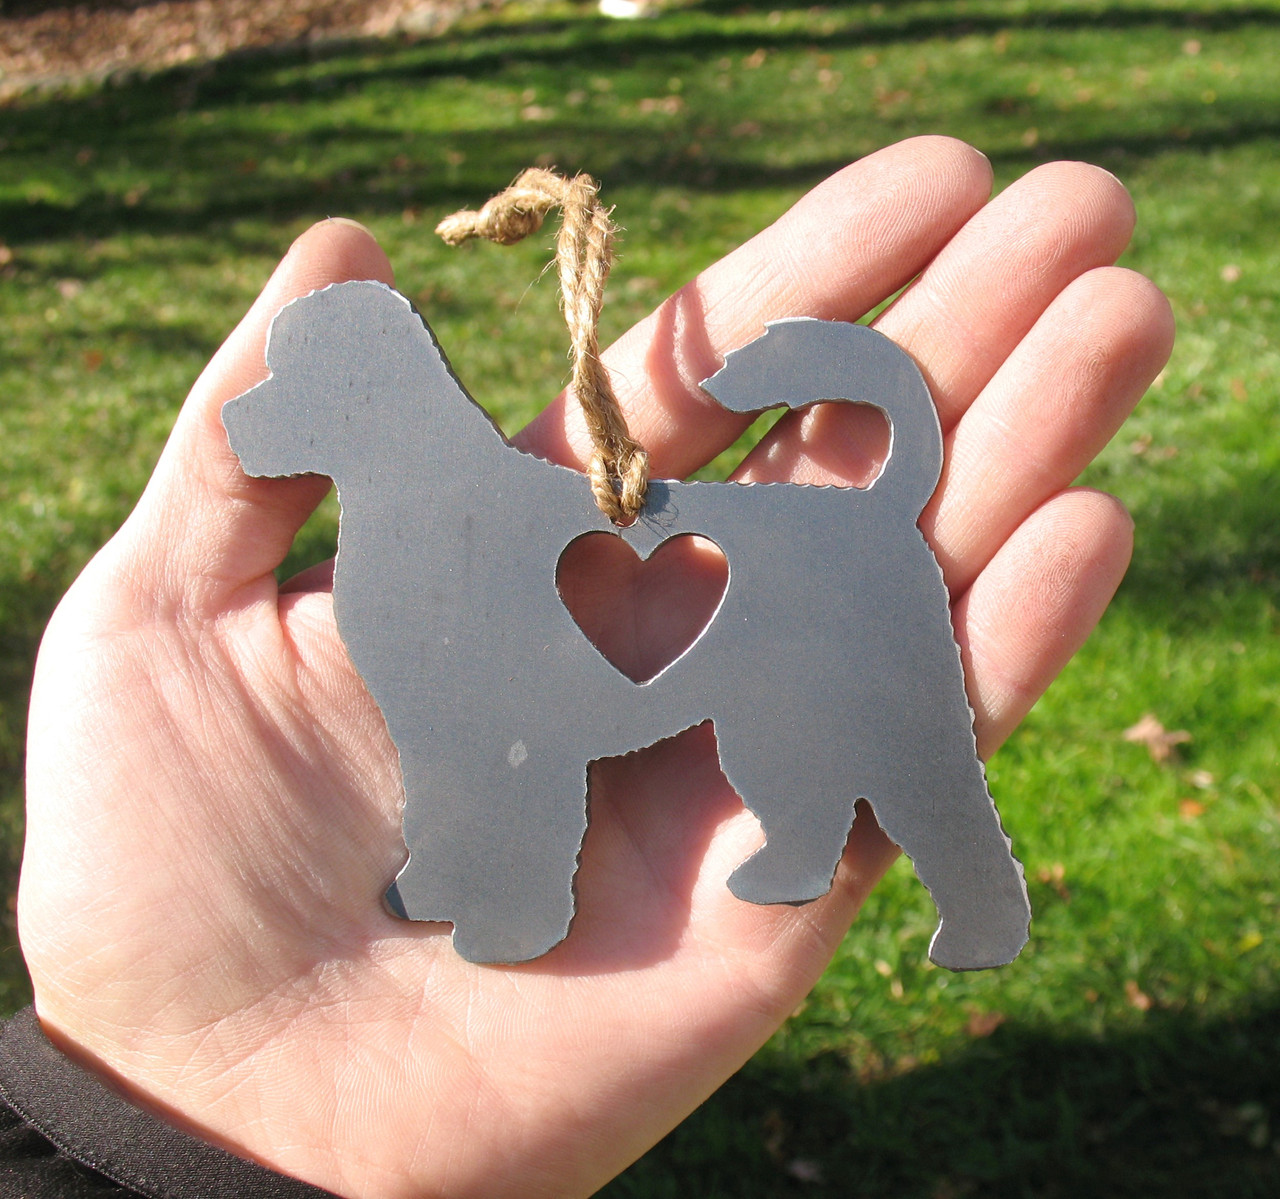 Portuguese Water Dog Pet Loss Gift Ornament - Pet Memorial - Dog Sympathy Remembrance Gift - Metal Dog Christmas Ornament